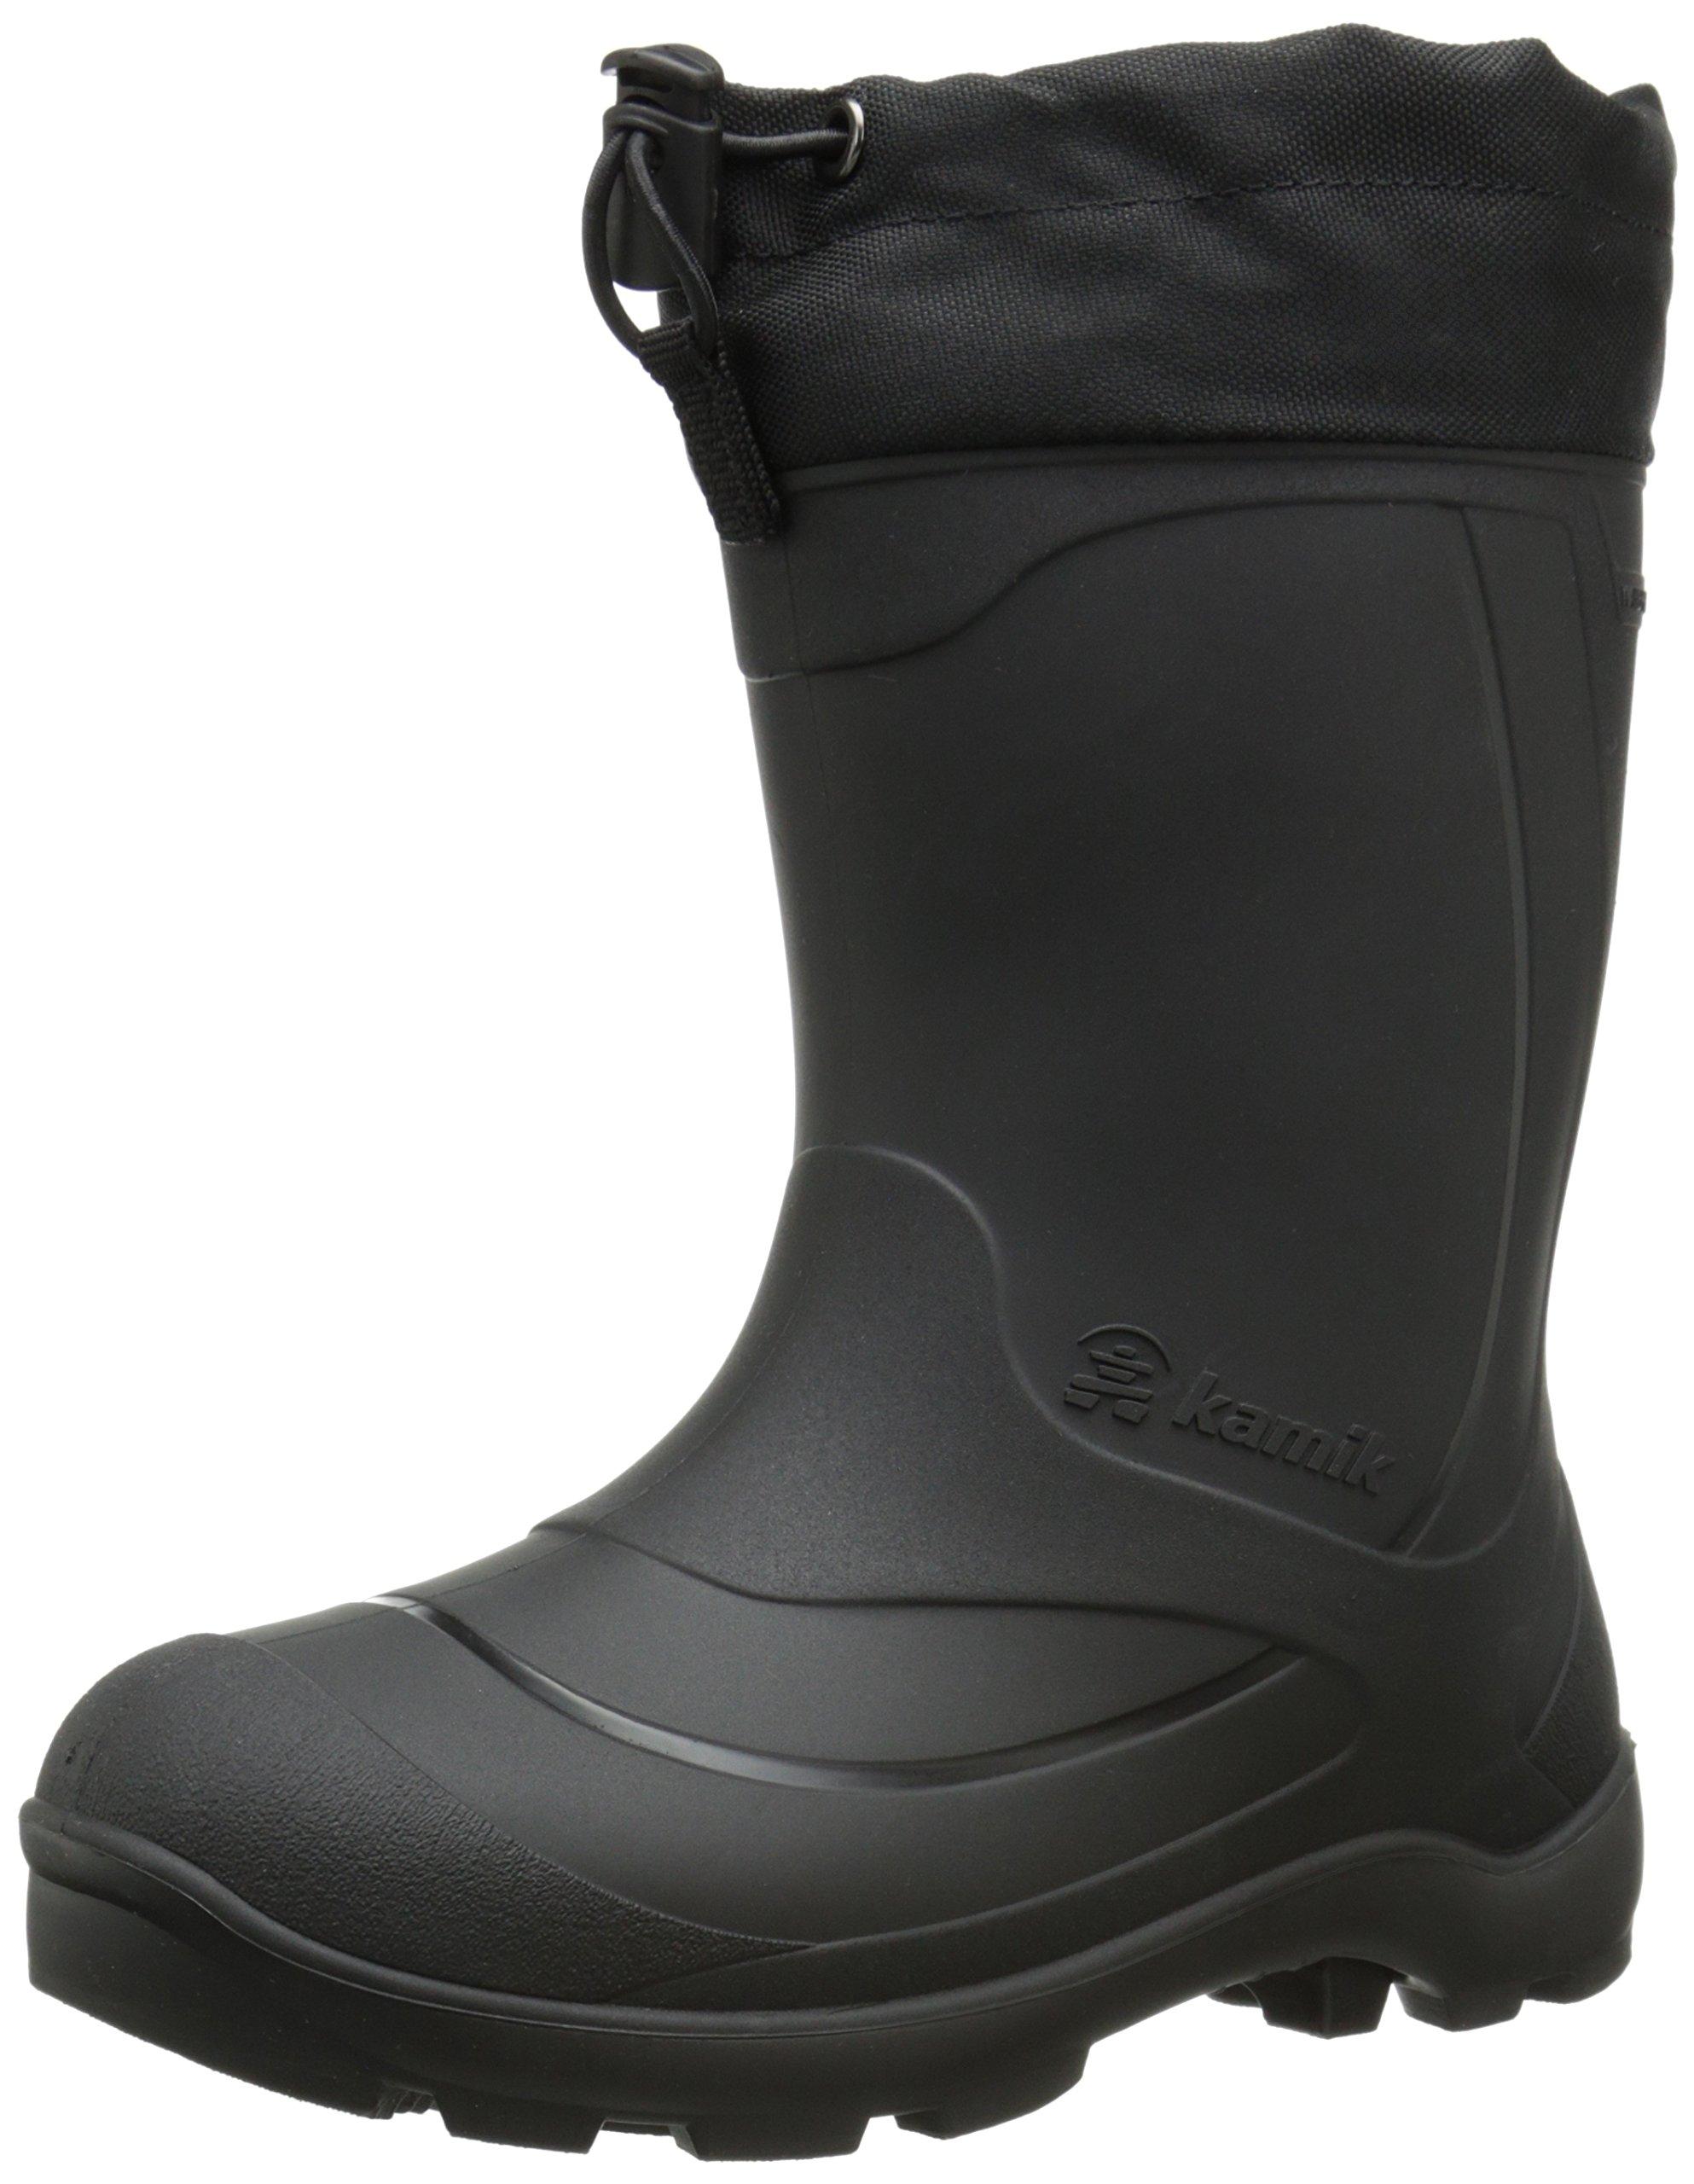 Kamik Snobuster1 Snow Boot (Toddler/Little Kid/Big Kid), Black, 1 M US Little Kid